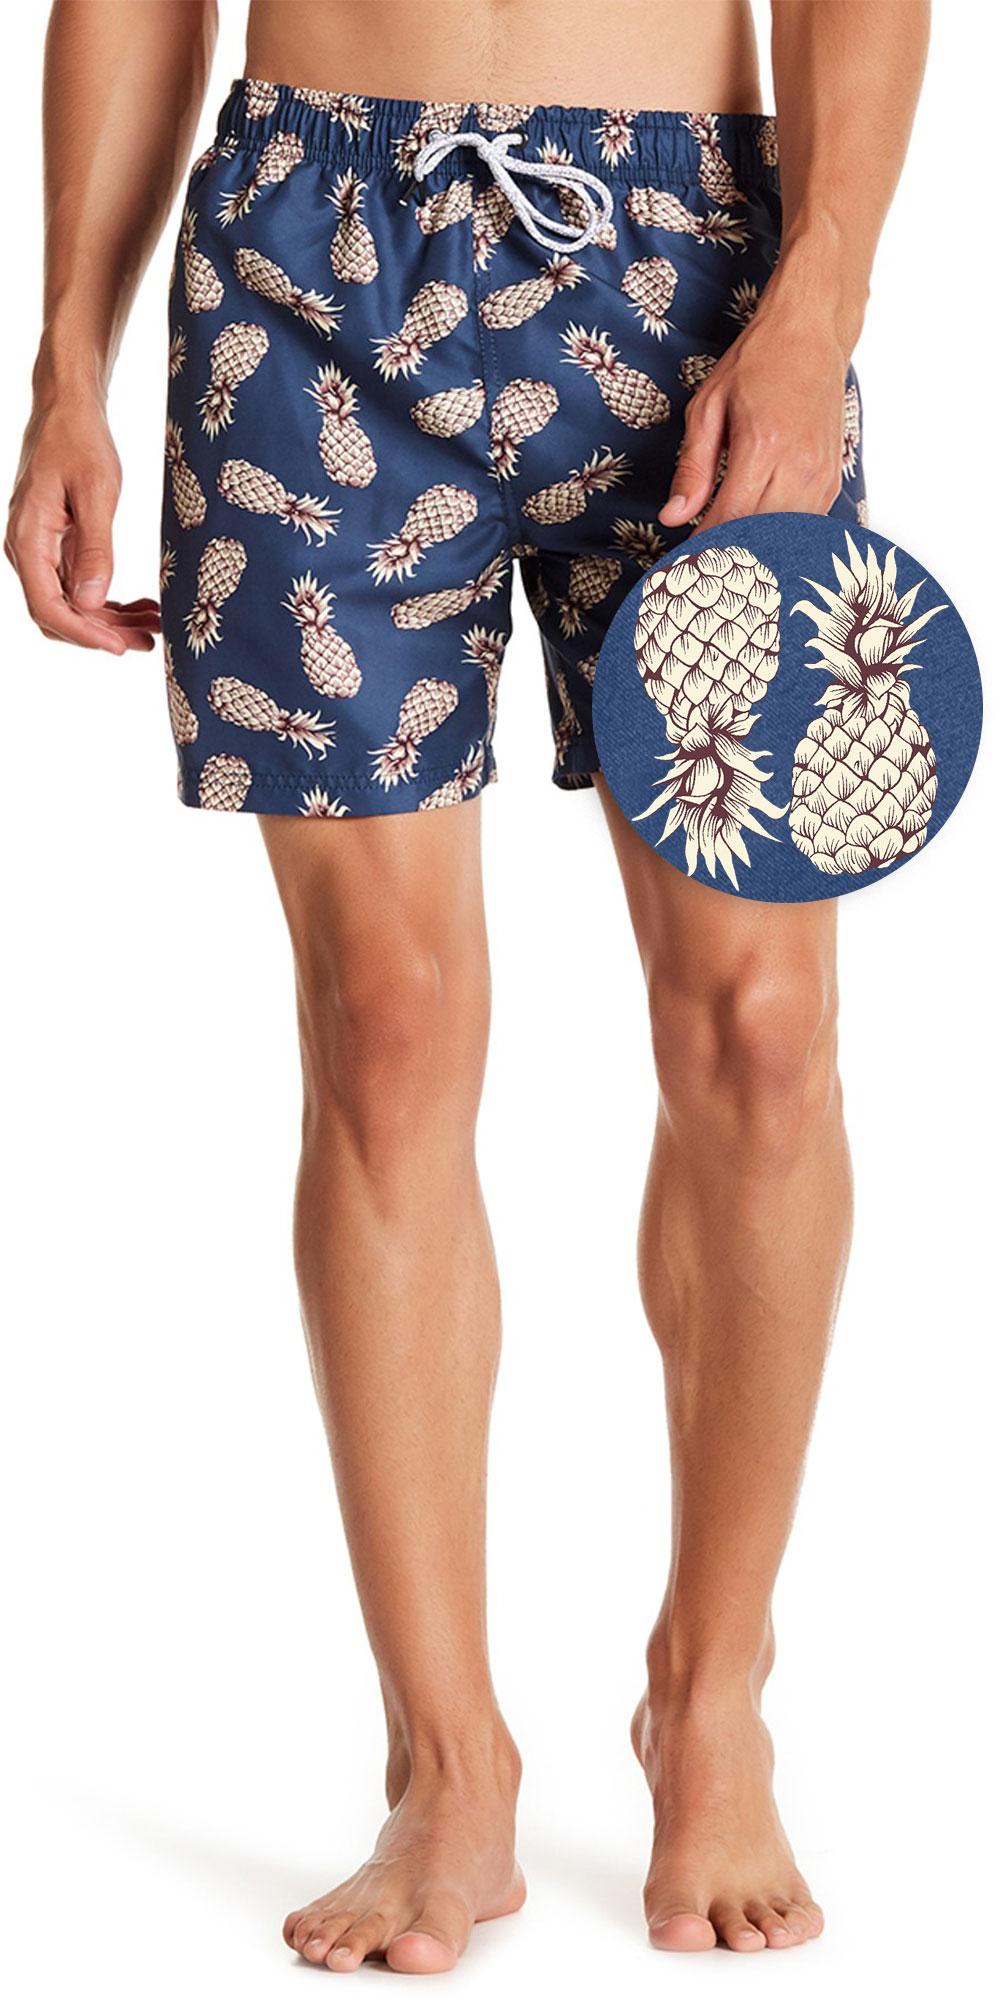 Swim Trunks Yoga Shorts Pineapple Shorts Festival Shorts Gym Shorts Mens Workout Shorts Men/'s Shorts Swimwear